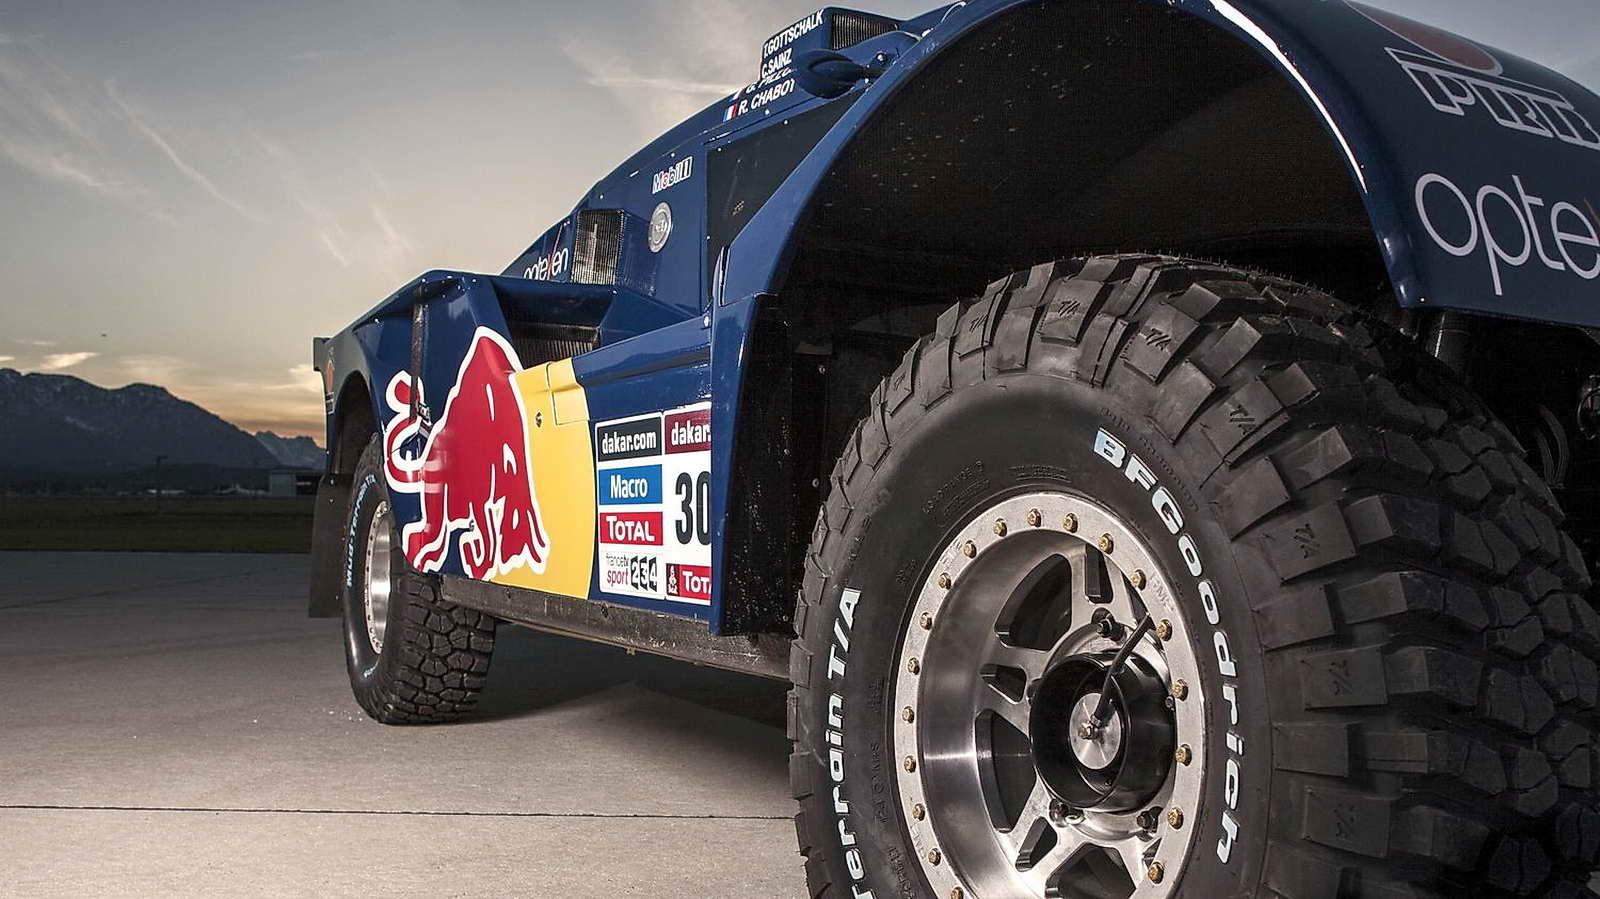 red bull smg buggy  la montura de sainz para el dakar 2014